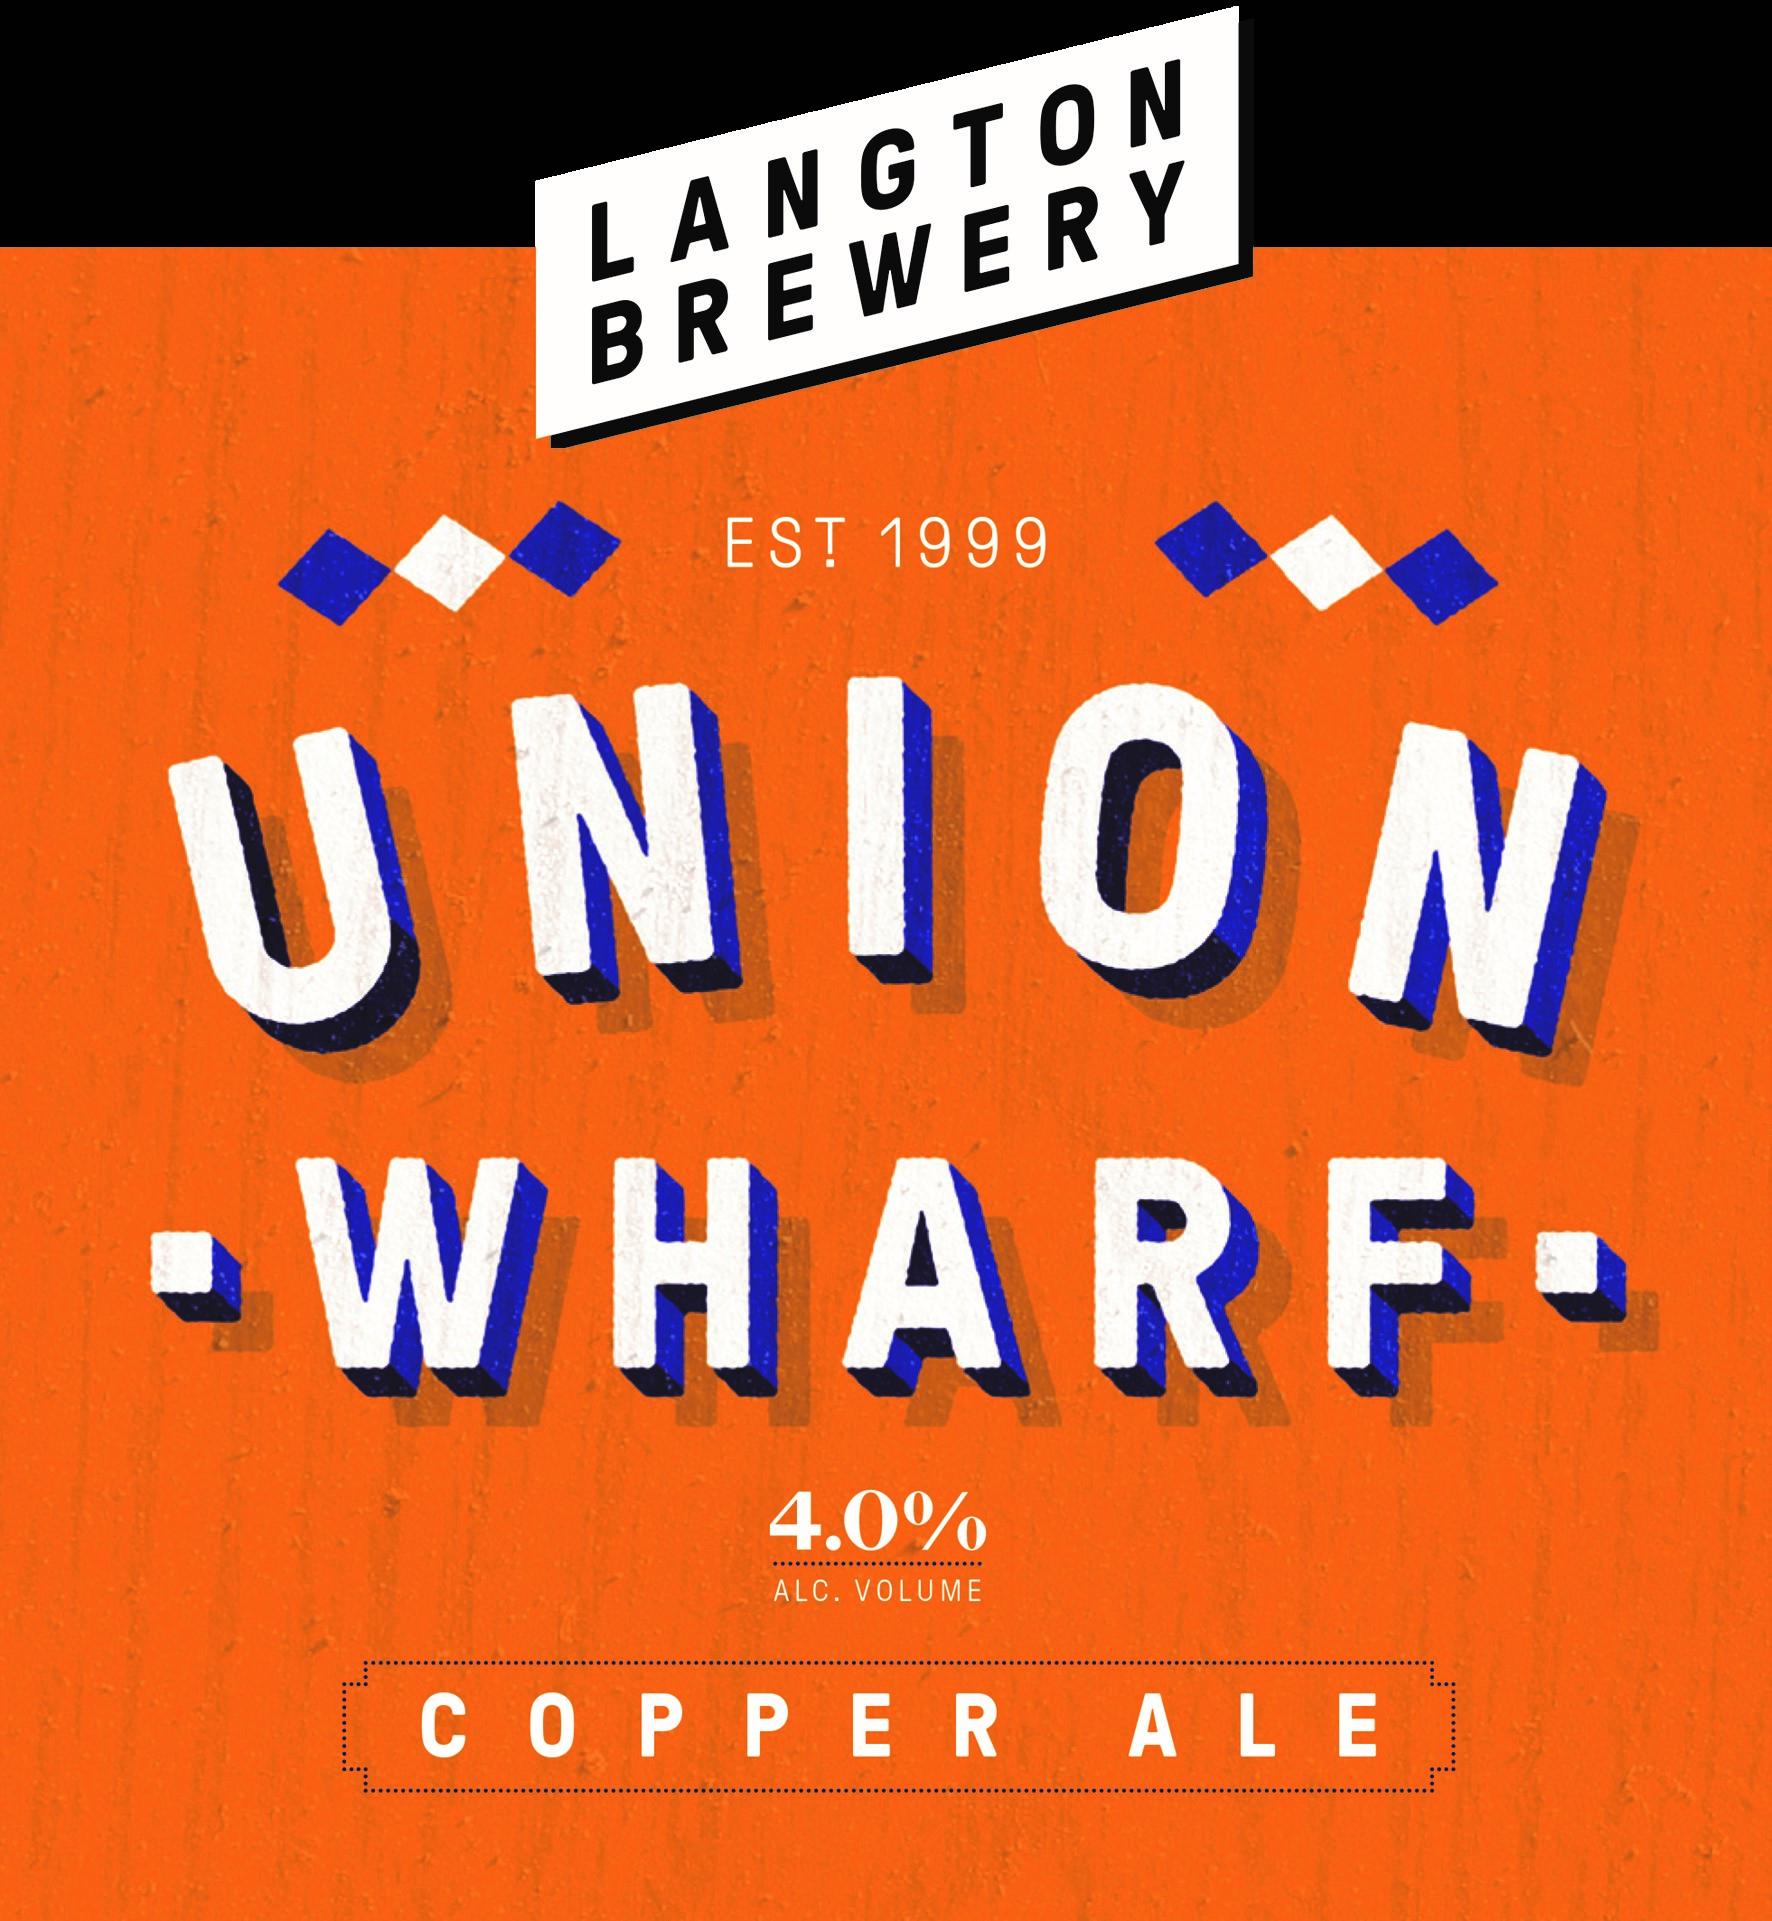 Langton Union Wharf 9 Gallons Copper 4.0%